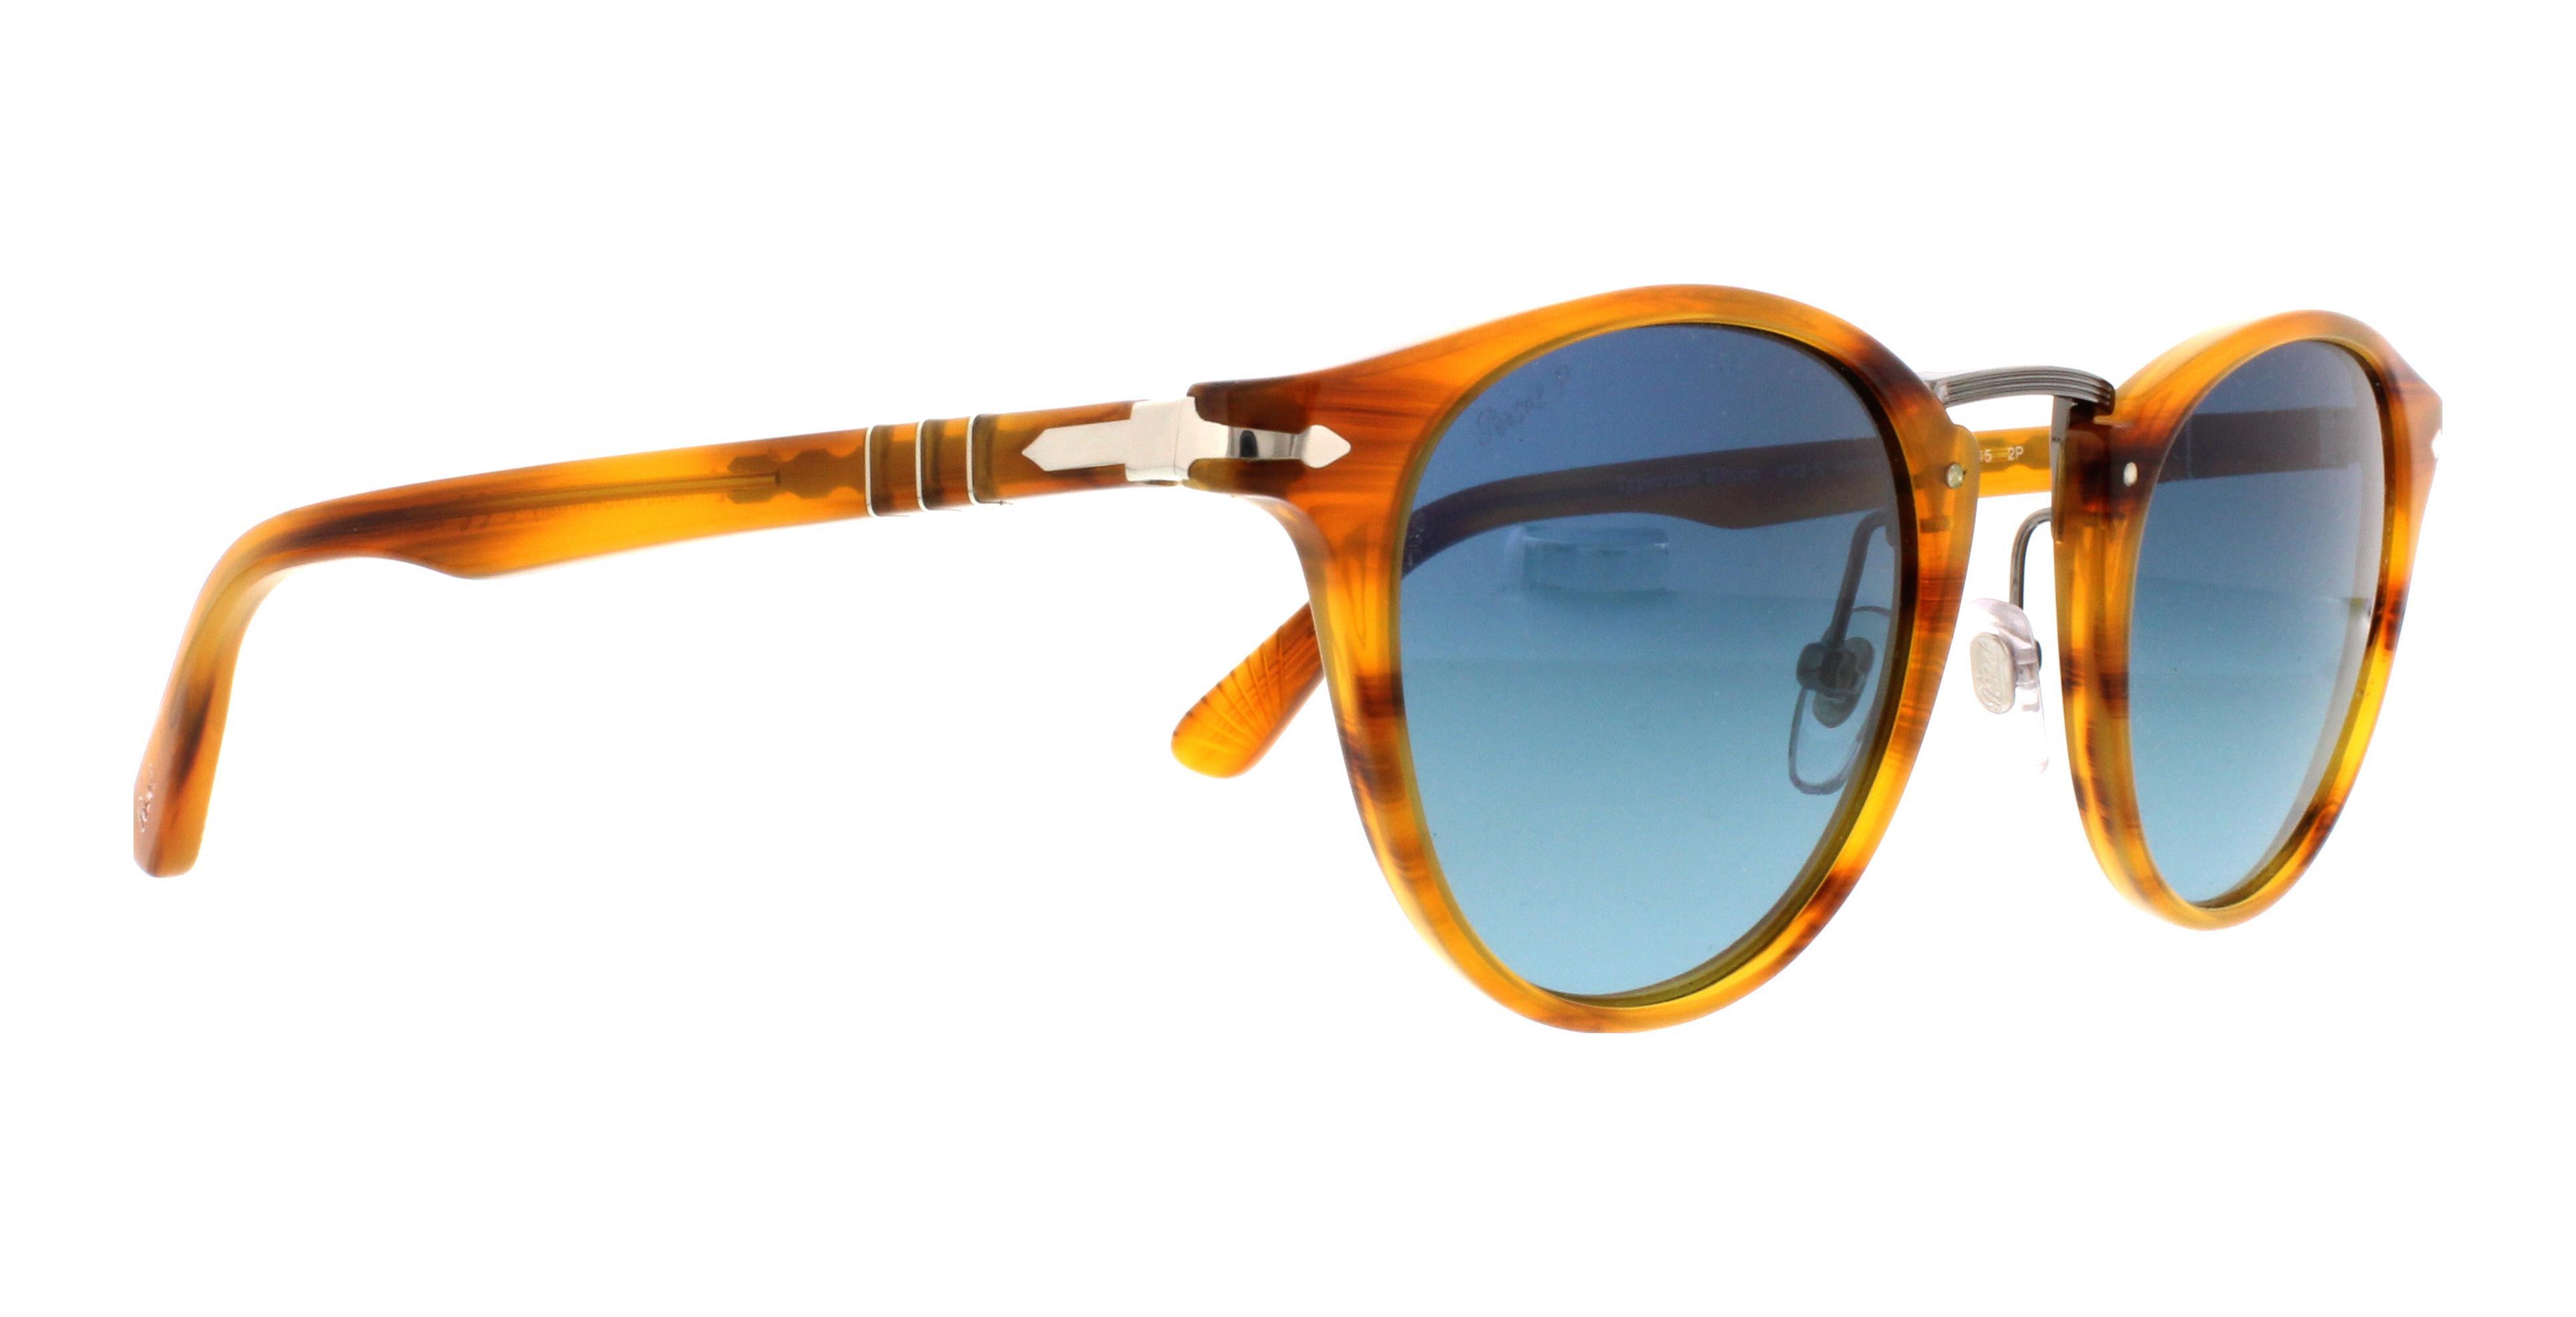 6105c2ee57 ... PERSOL Sunglasses PO3108S 960S3 Striped Brown 49MM wholesale price  3b573 c9fe8 ...